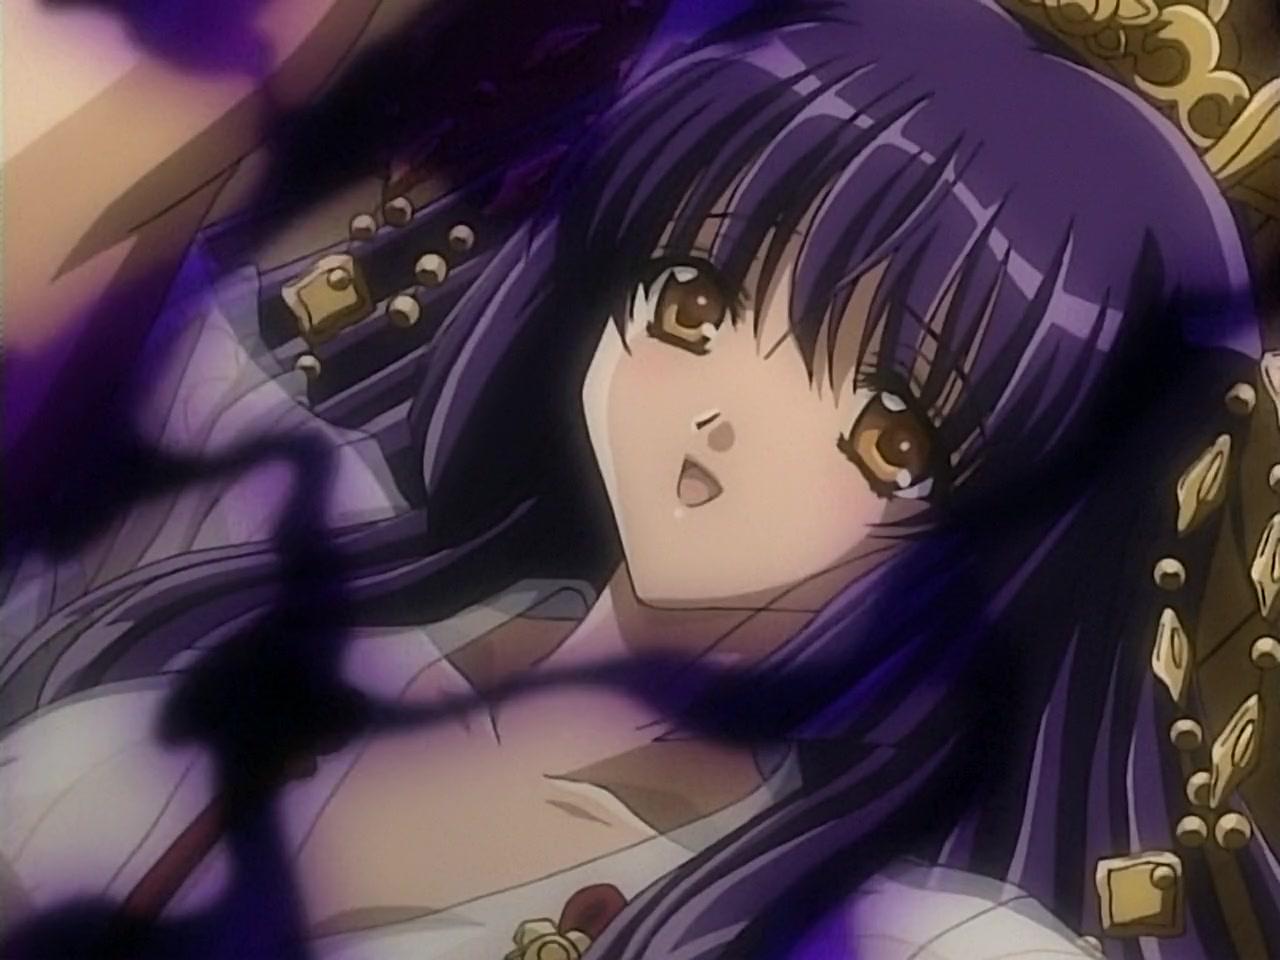 Animasi Hentai young and sweet anime girl in romantic hentai cartoon